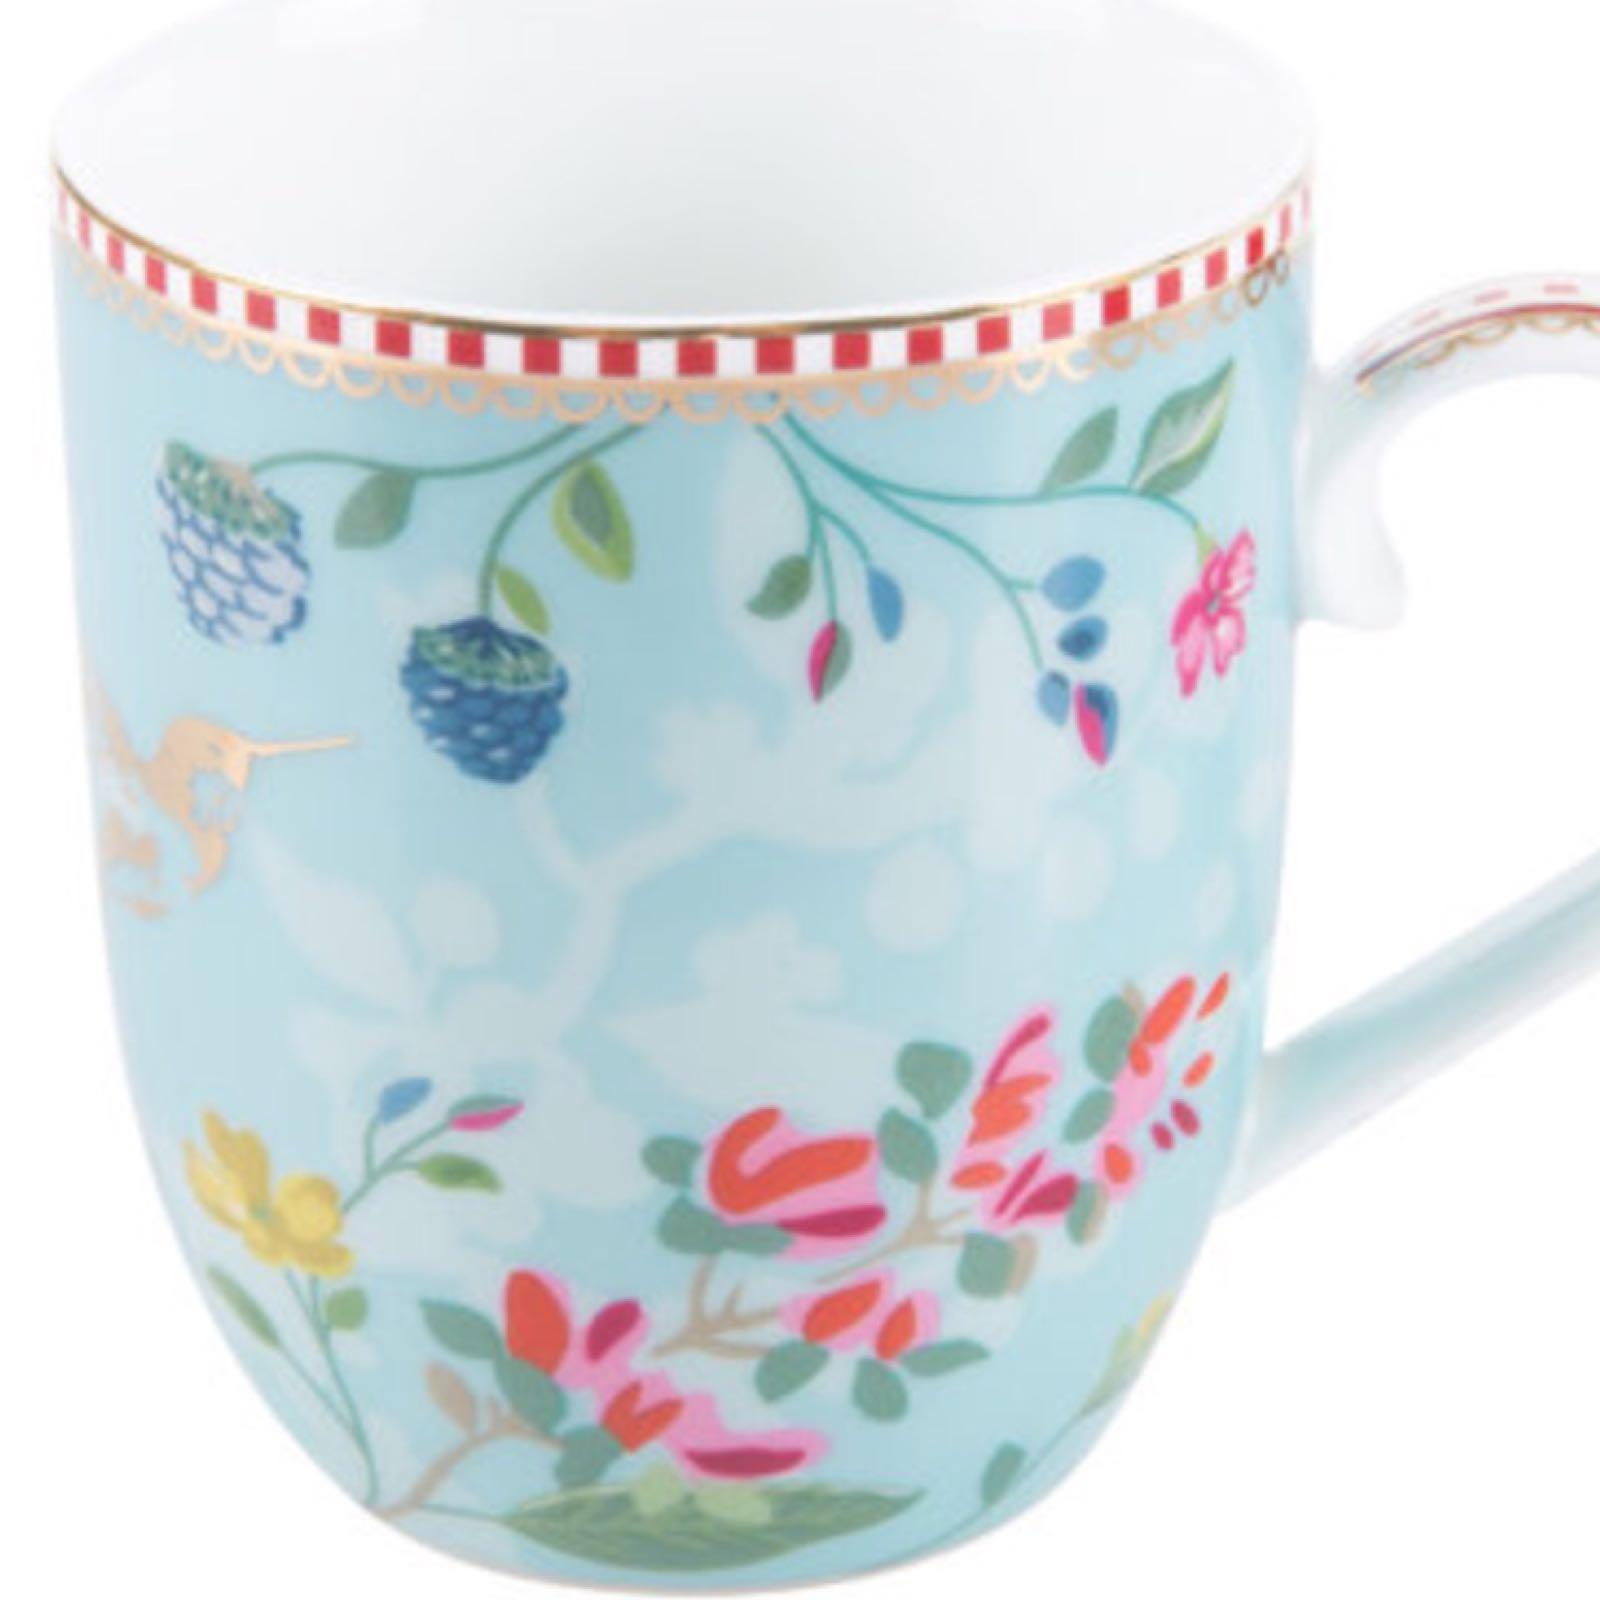 Pip studio hummingbird small mug blue